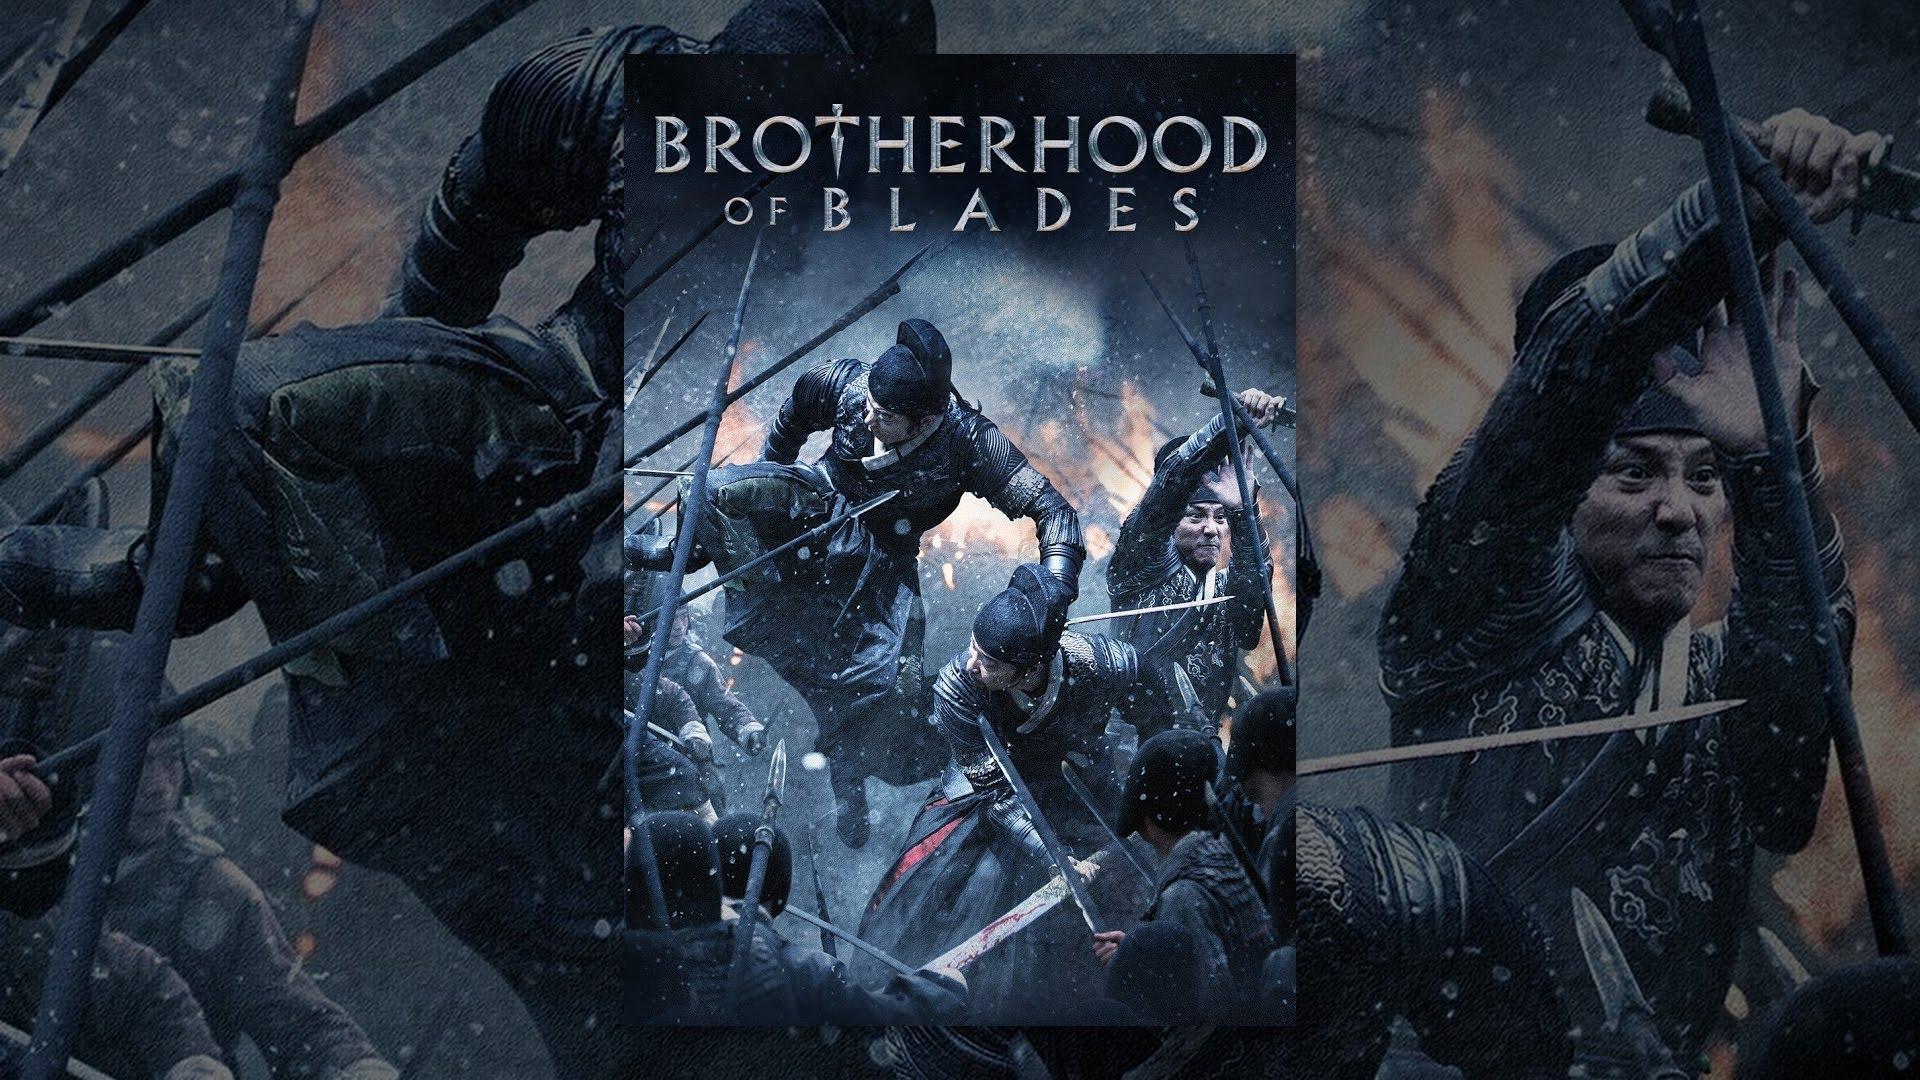 Download Brotherhood of Blades